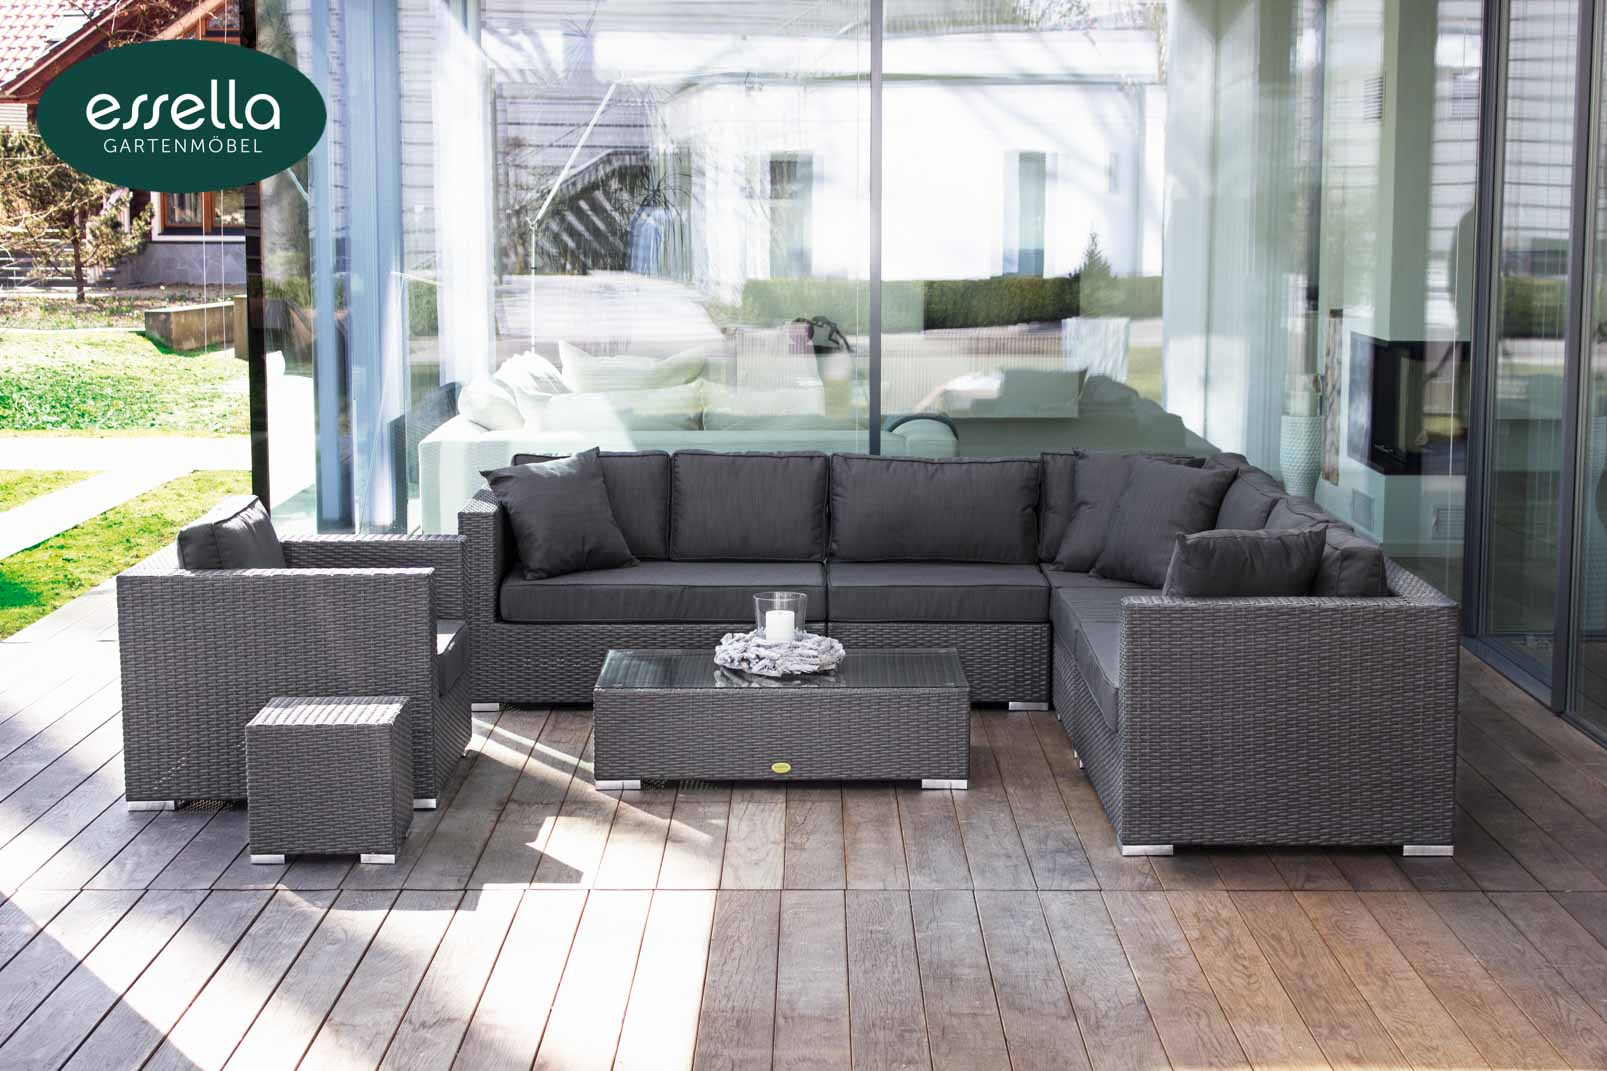 essella polyrattan loungem bel miami flachgeflecht. Black Bedroom Furniture Sets. Home Design Ideas